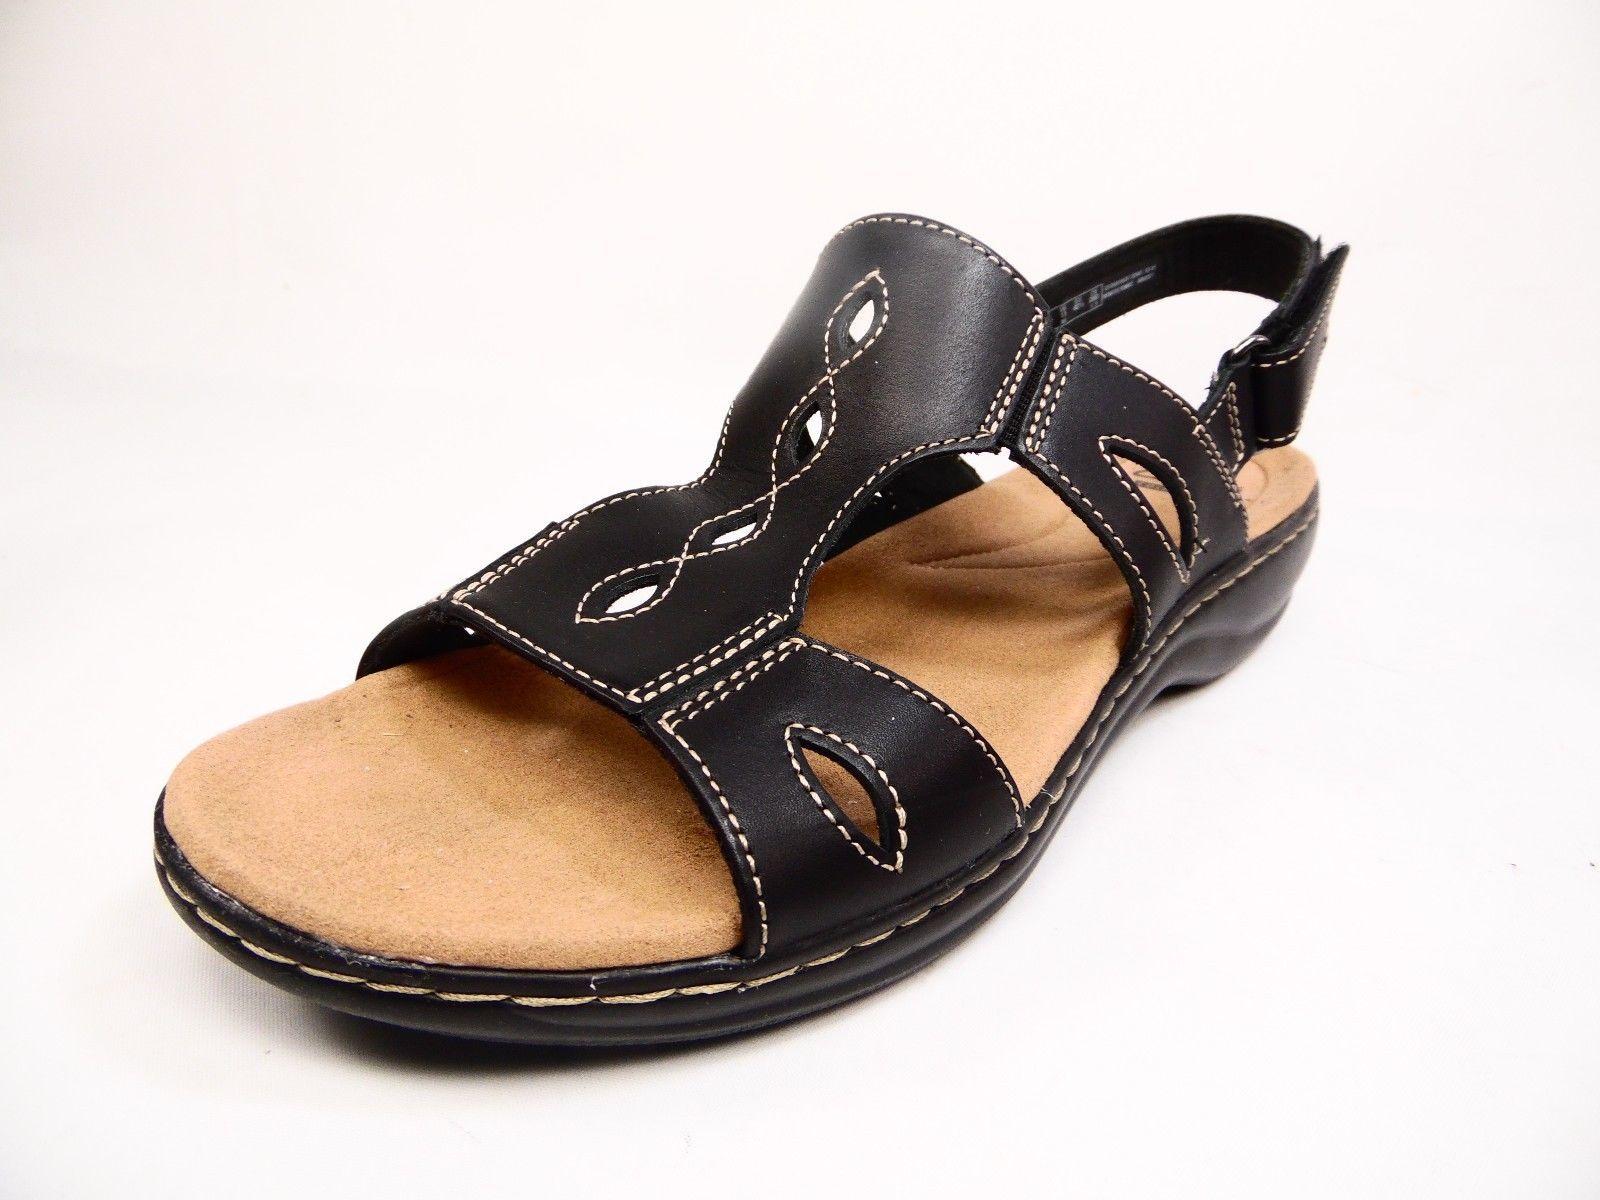 213220386181 Clarks Leisa Lakelyn Leather Womens Sandal Low Heel Shoes Black Size 11M